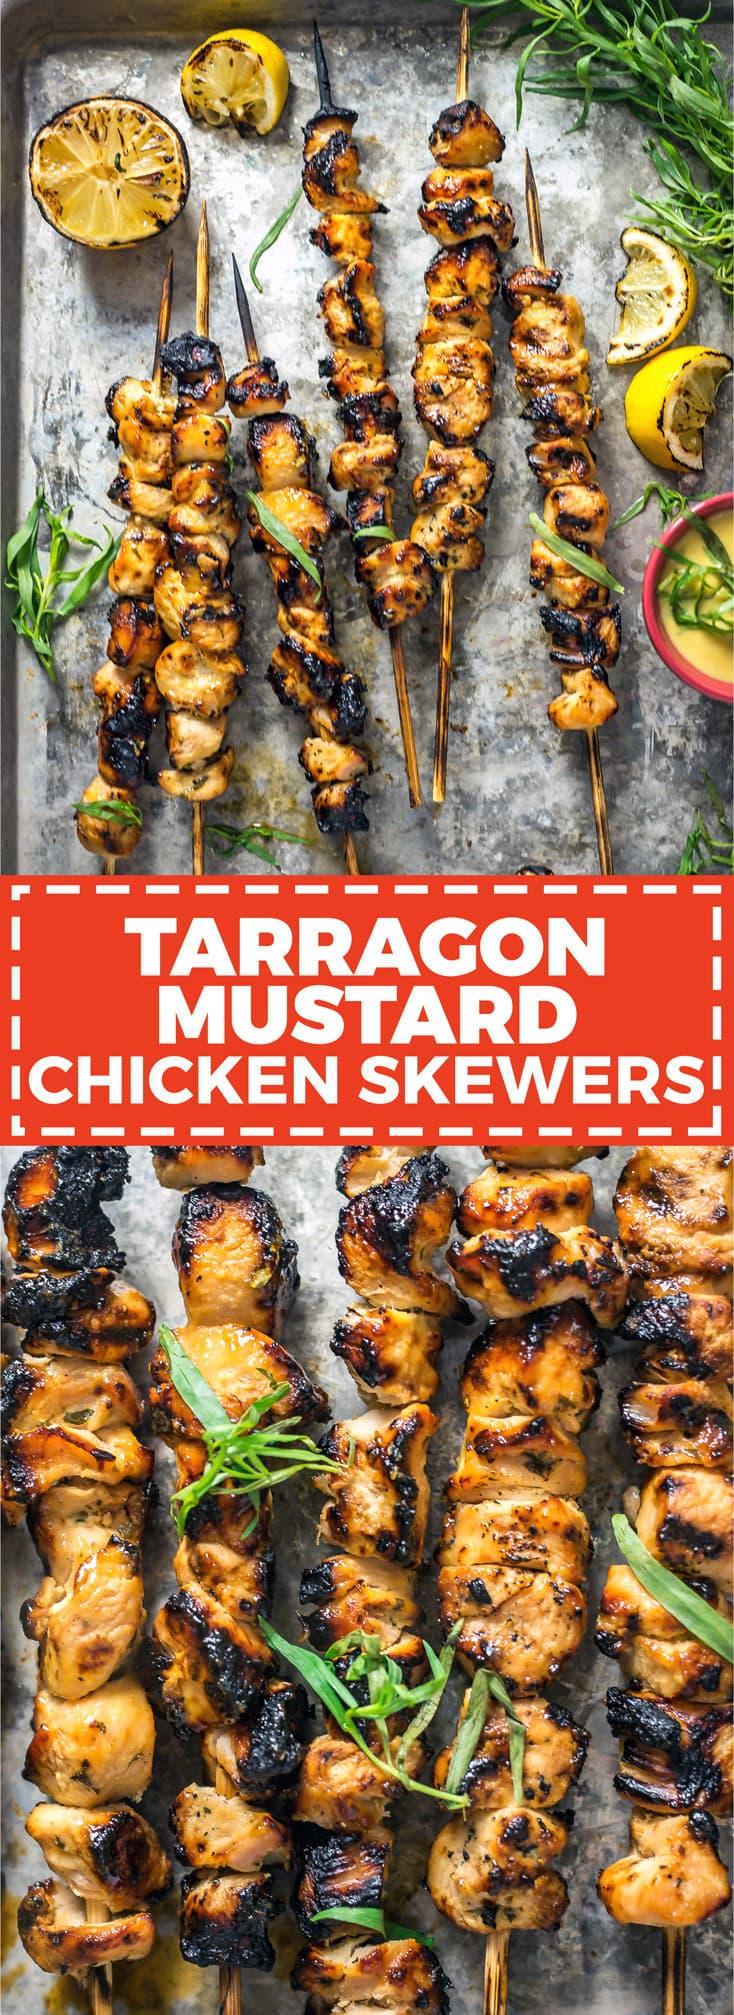 Tarragon Mustard Chicken Skewers. Dijon mustard, garlic, lemon juice, olive oil, tarragon and honey are all you need to make an incredibly flavorful chicken marinade. | hostthetoast.com